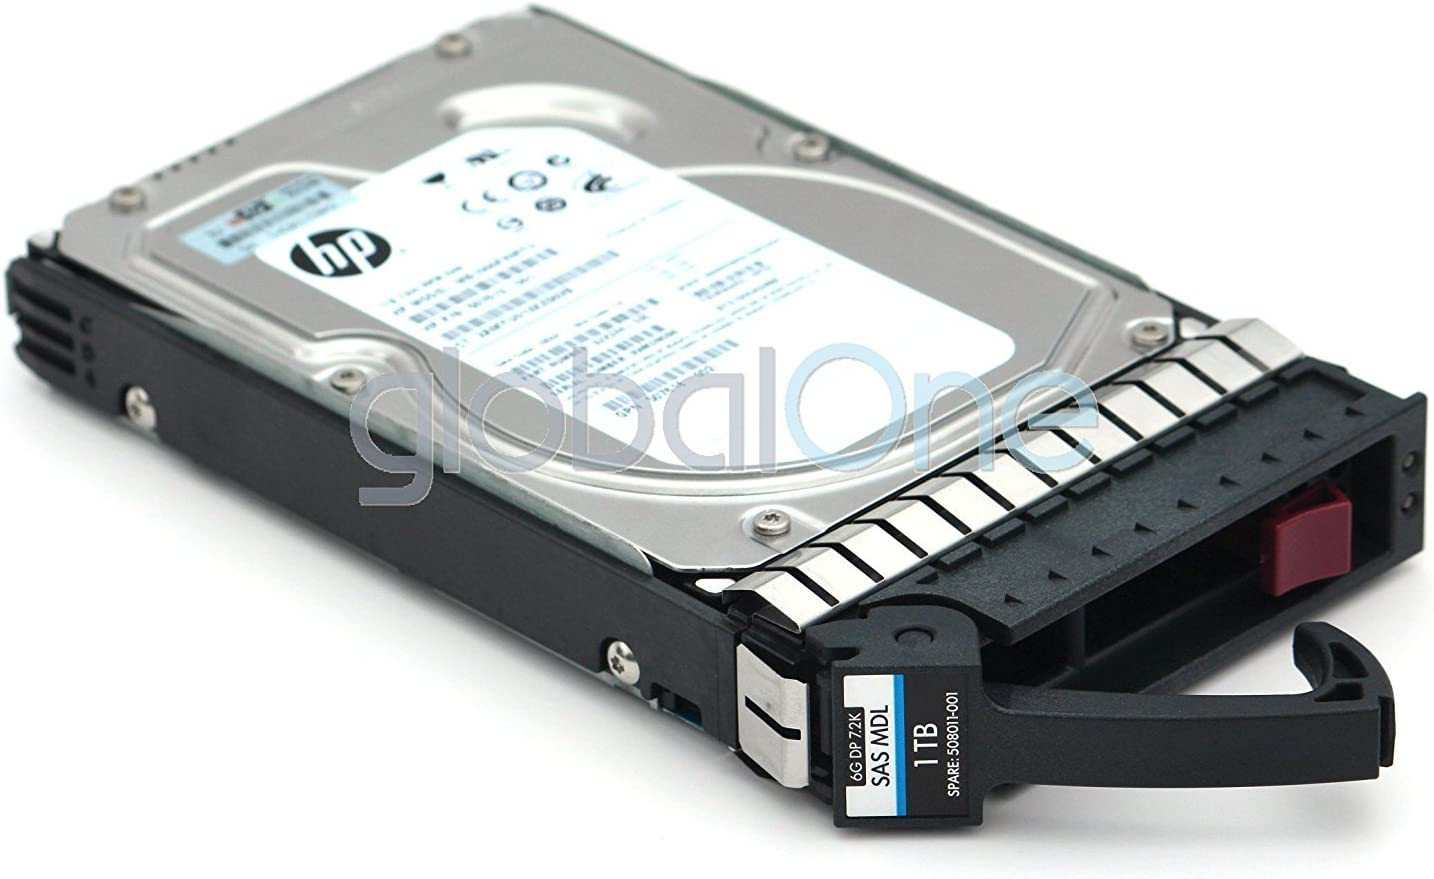 HP MB1000FAMYU 1TB 7.2K 3.5 SAS DP 6G MDL G8 SC HDD With Tray